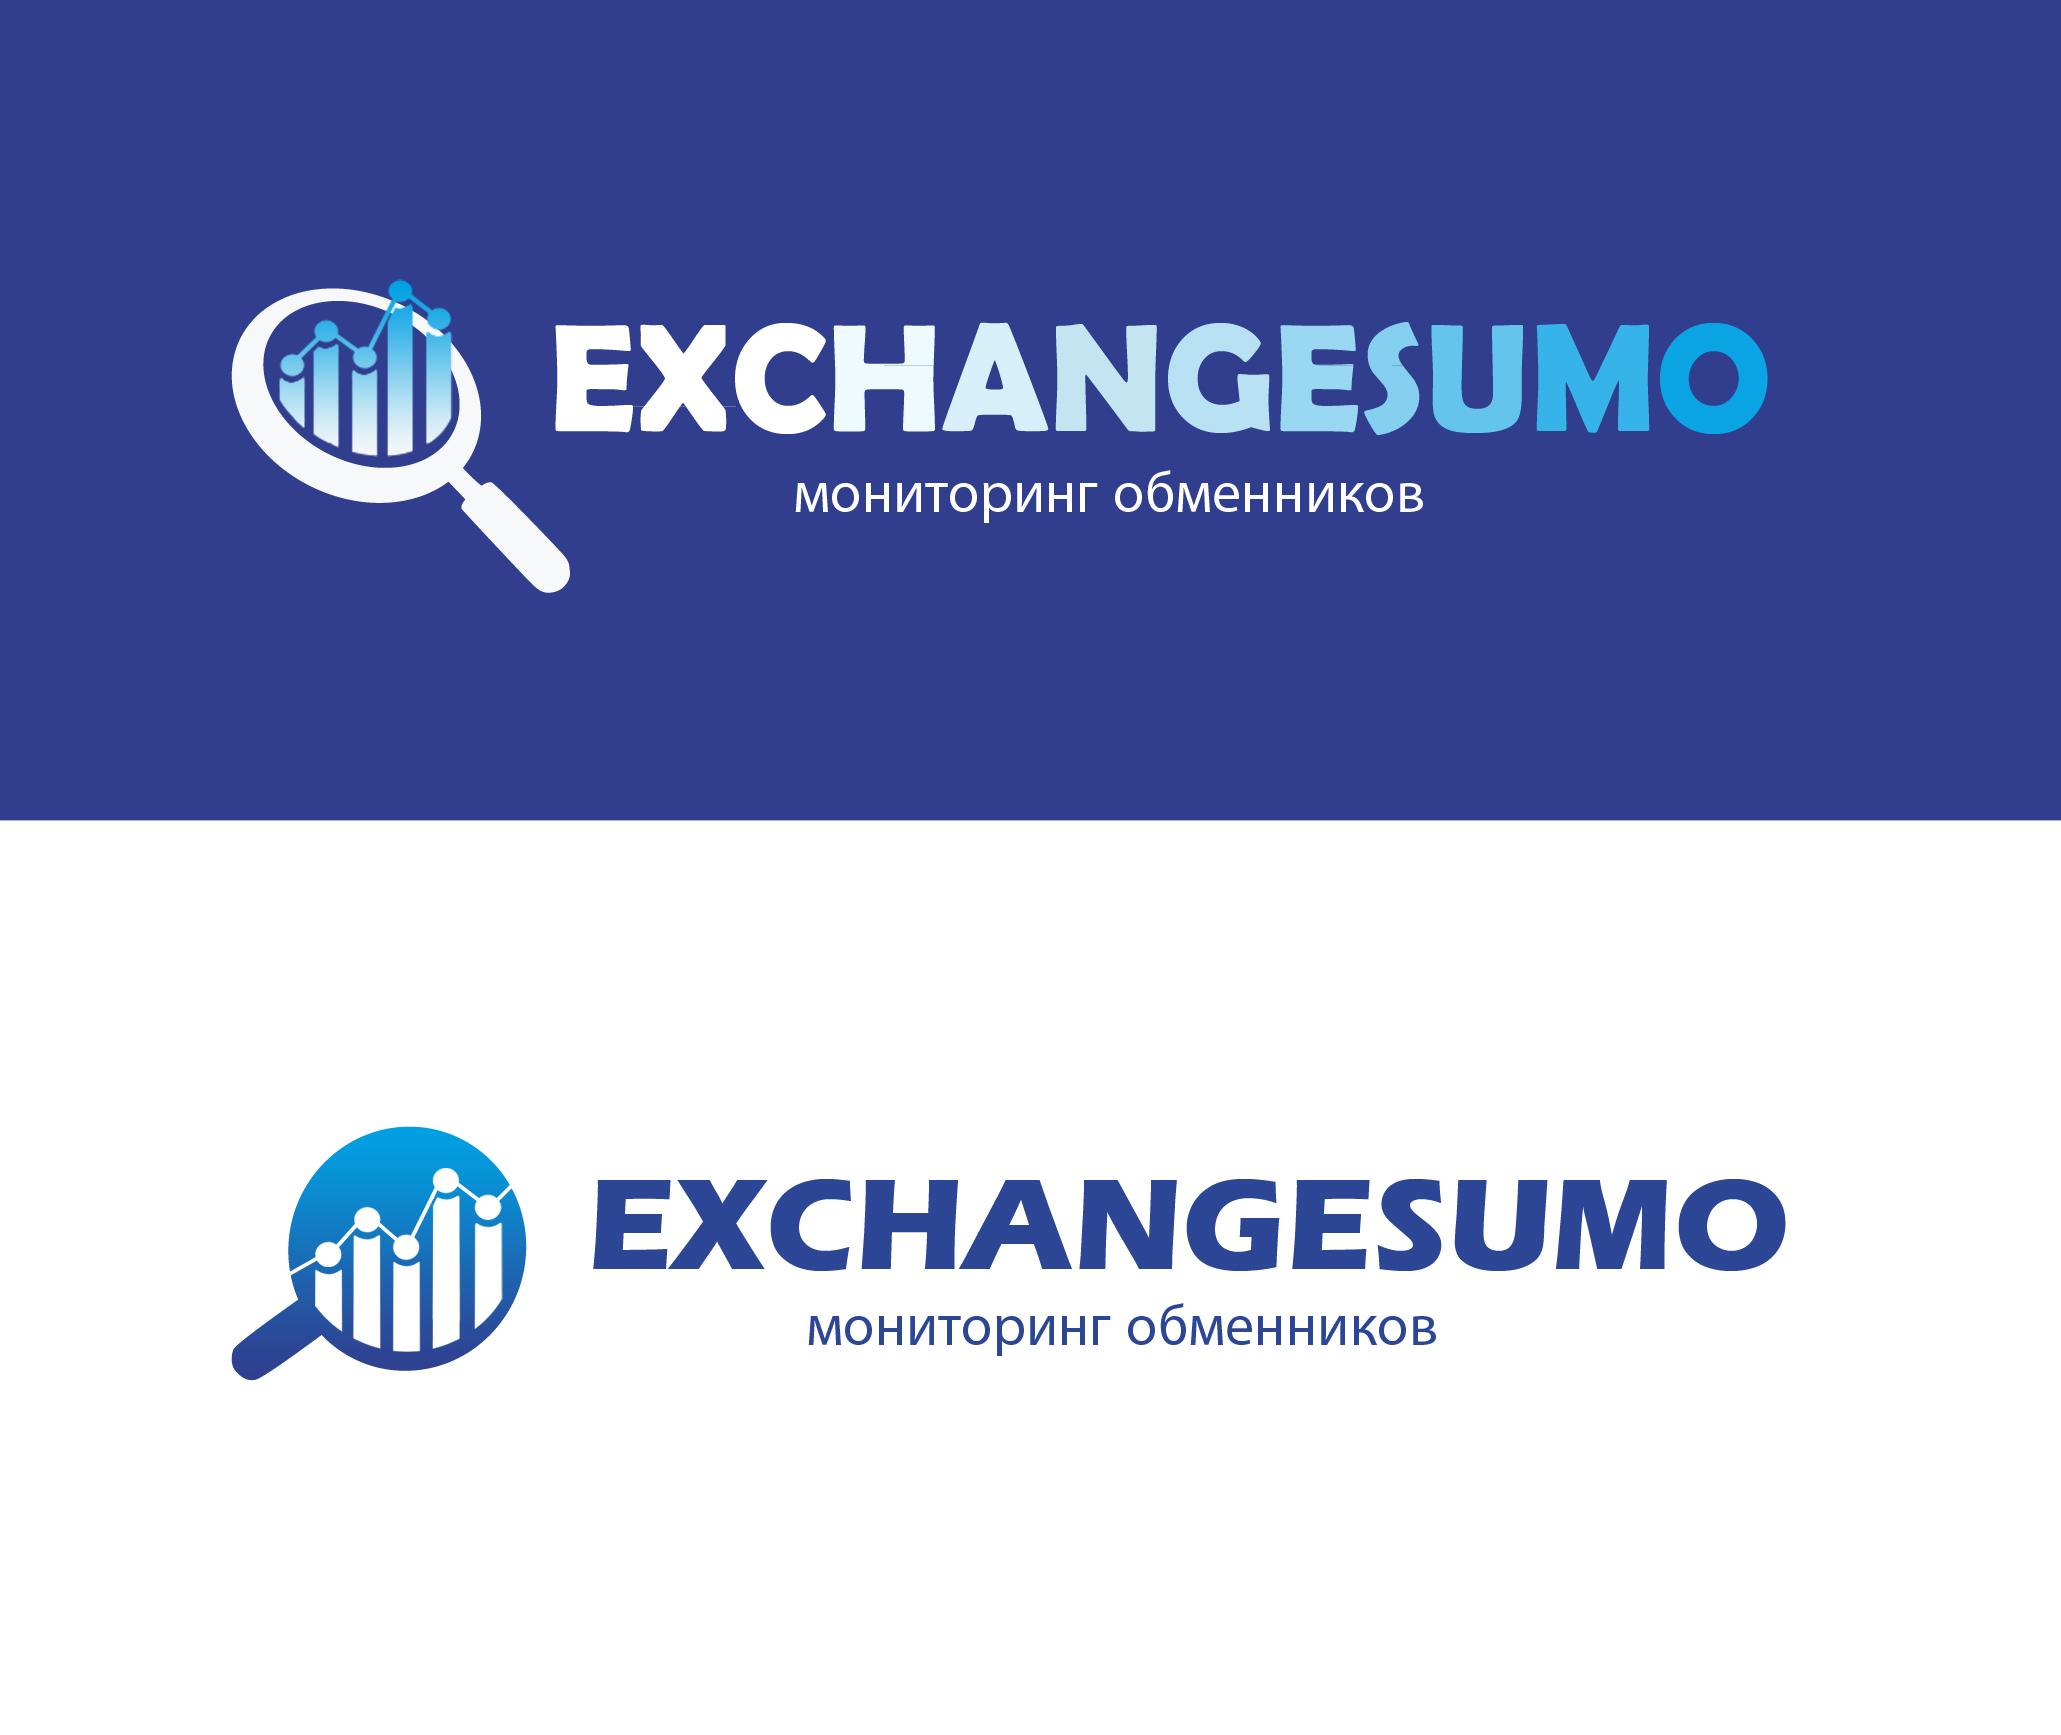 Логотип для мониторинга обменников фото f_2675baf99577a6d6.jpg